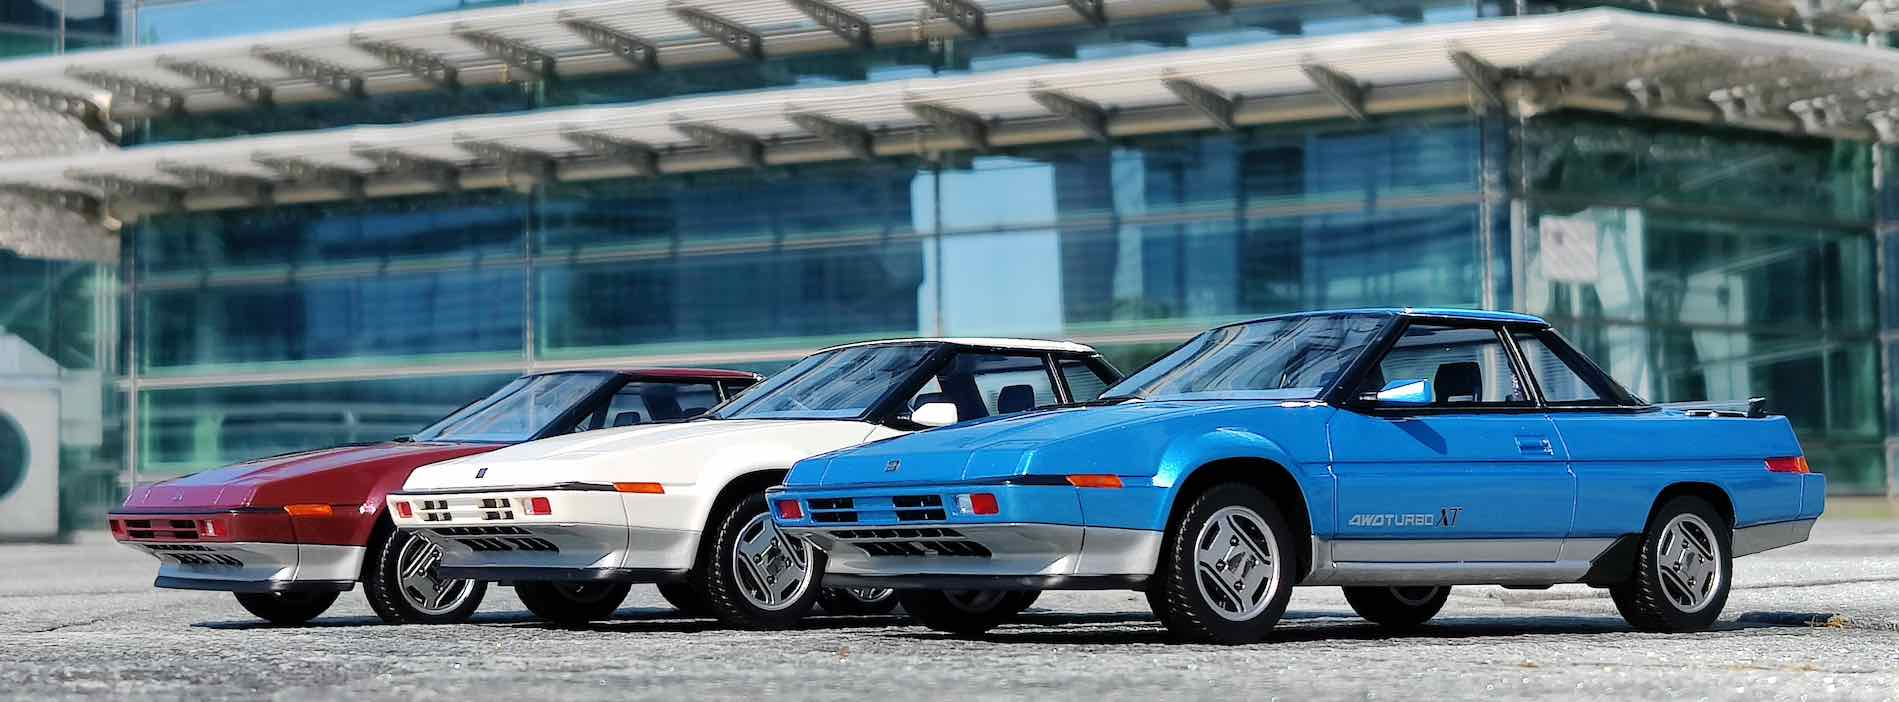 XT Turbo 1